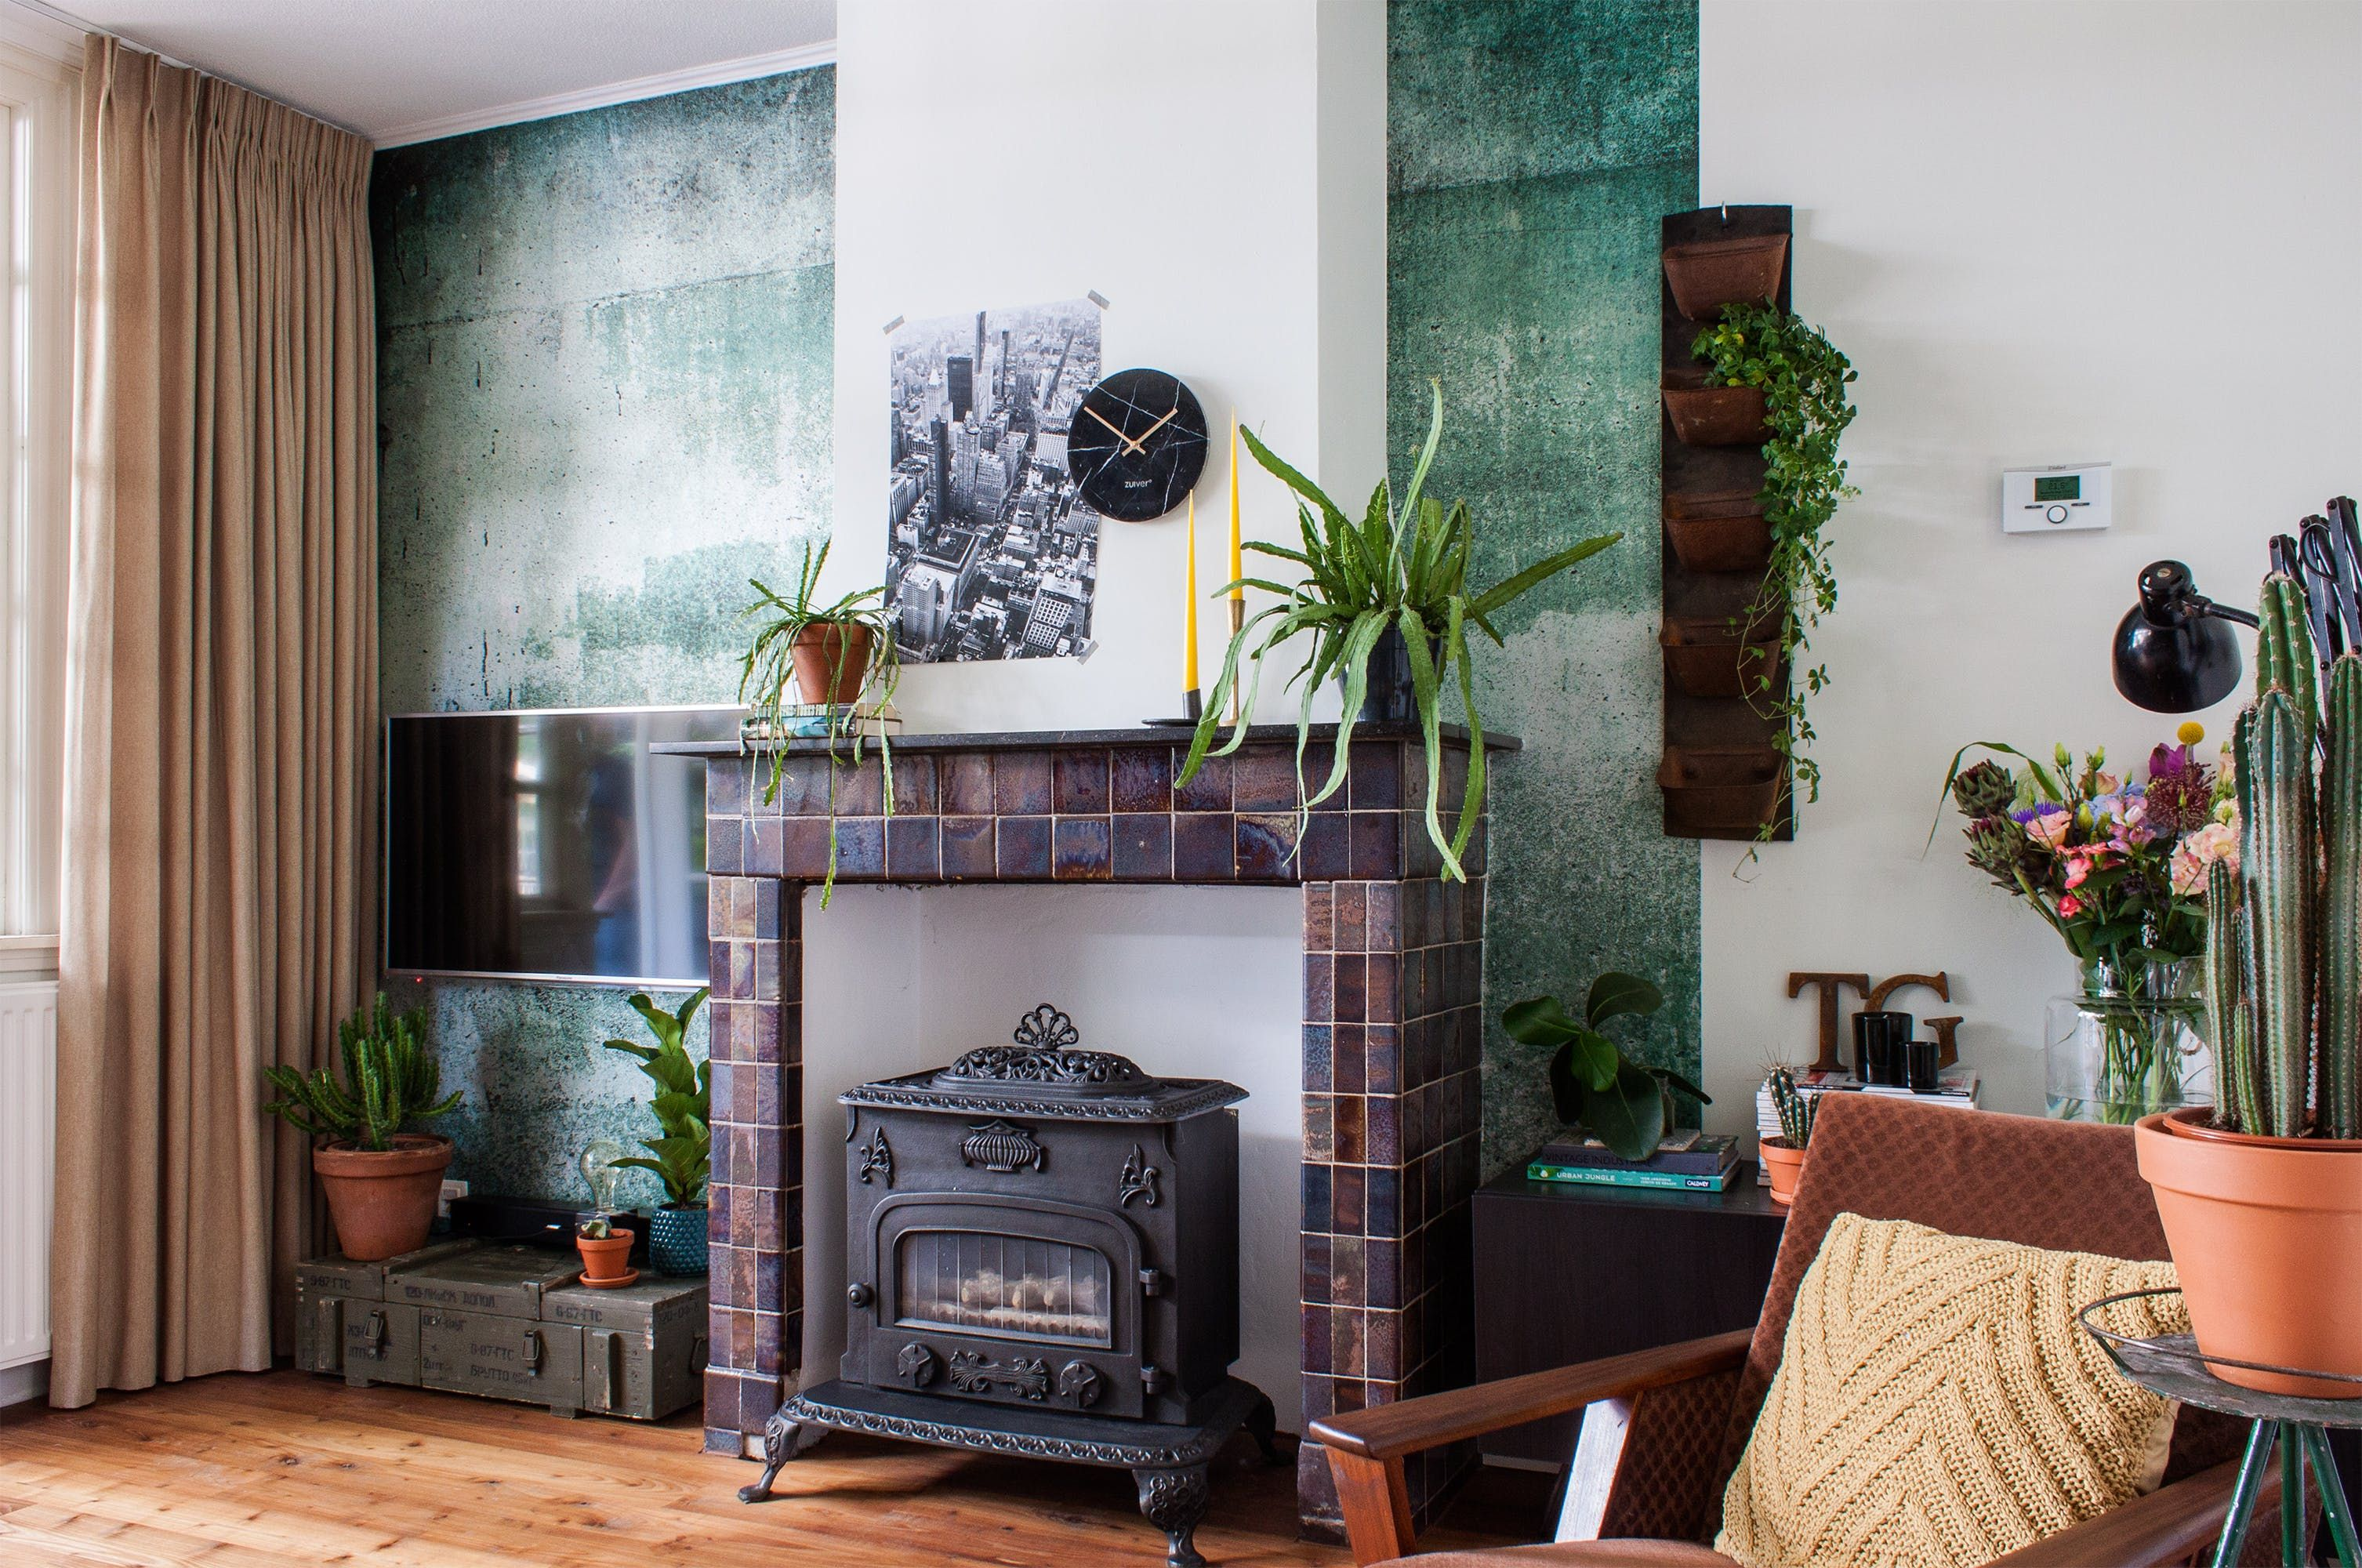 Attractive A 1920s Vintage Industrial Dutch Home. Interior PaintApartment ... Design Ideas